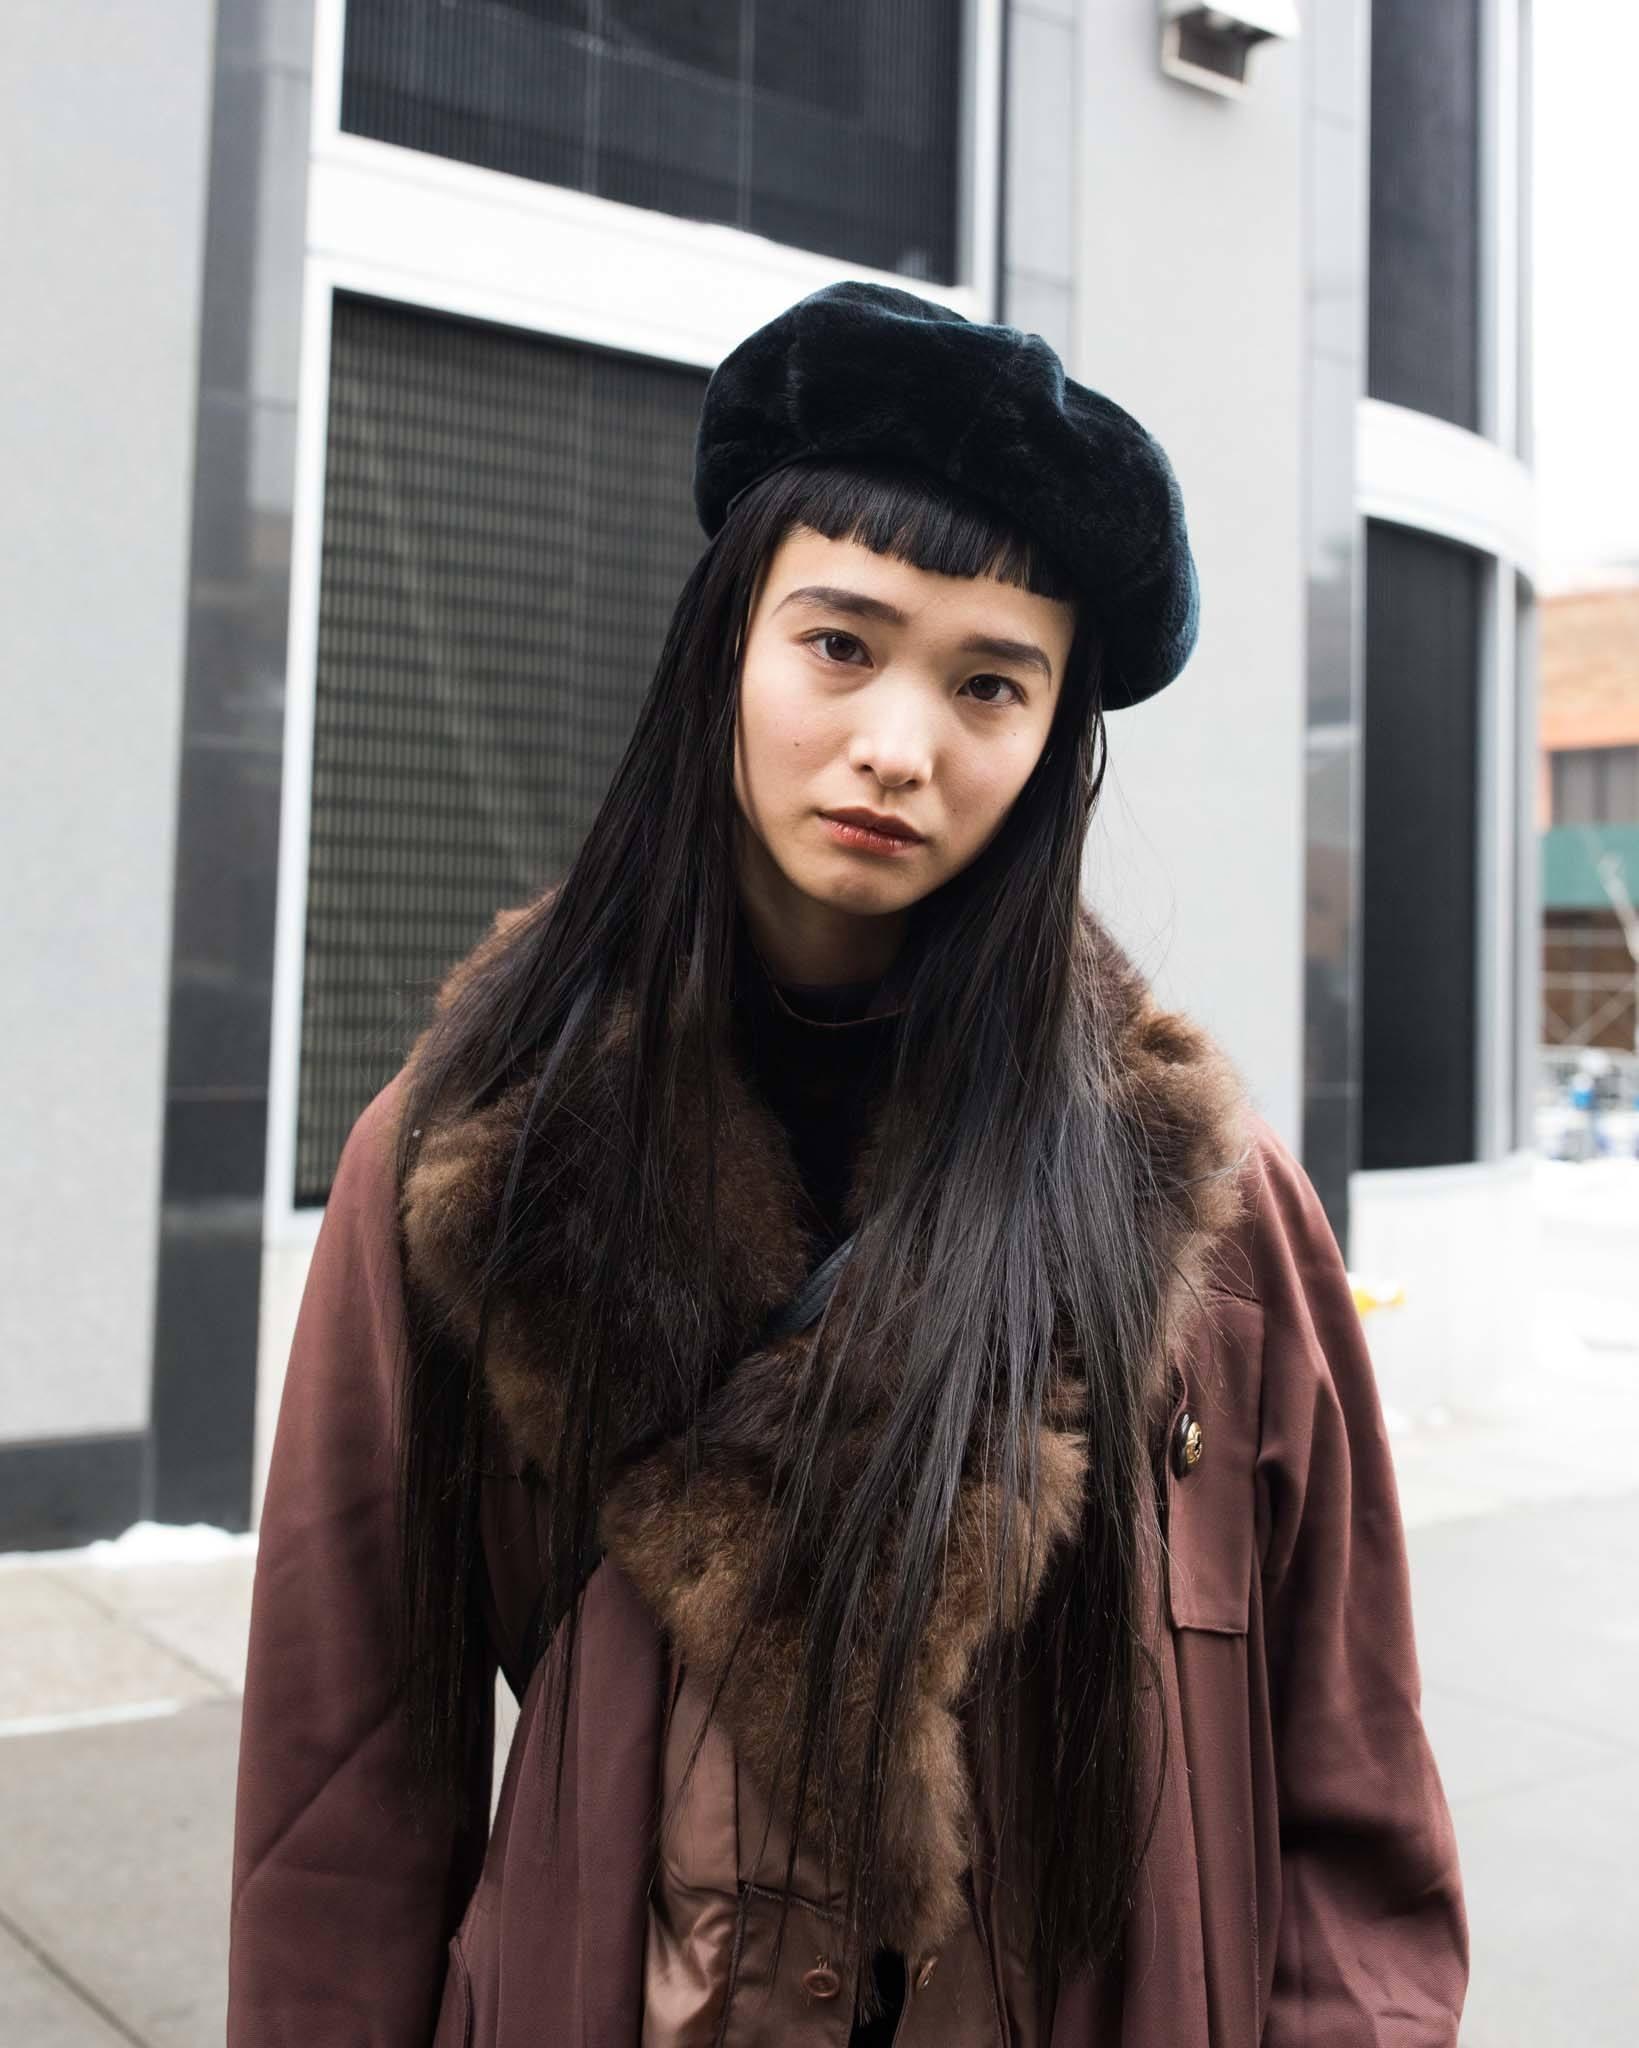 Mujer asiática de cabello ultra lacio peinado con flequillo asimétrico